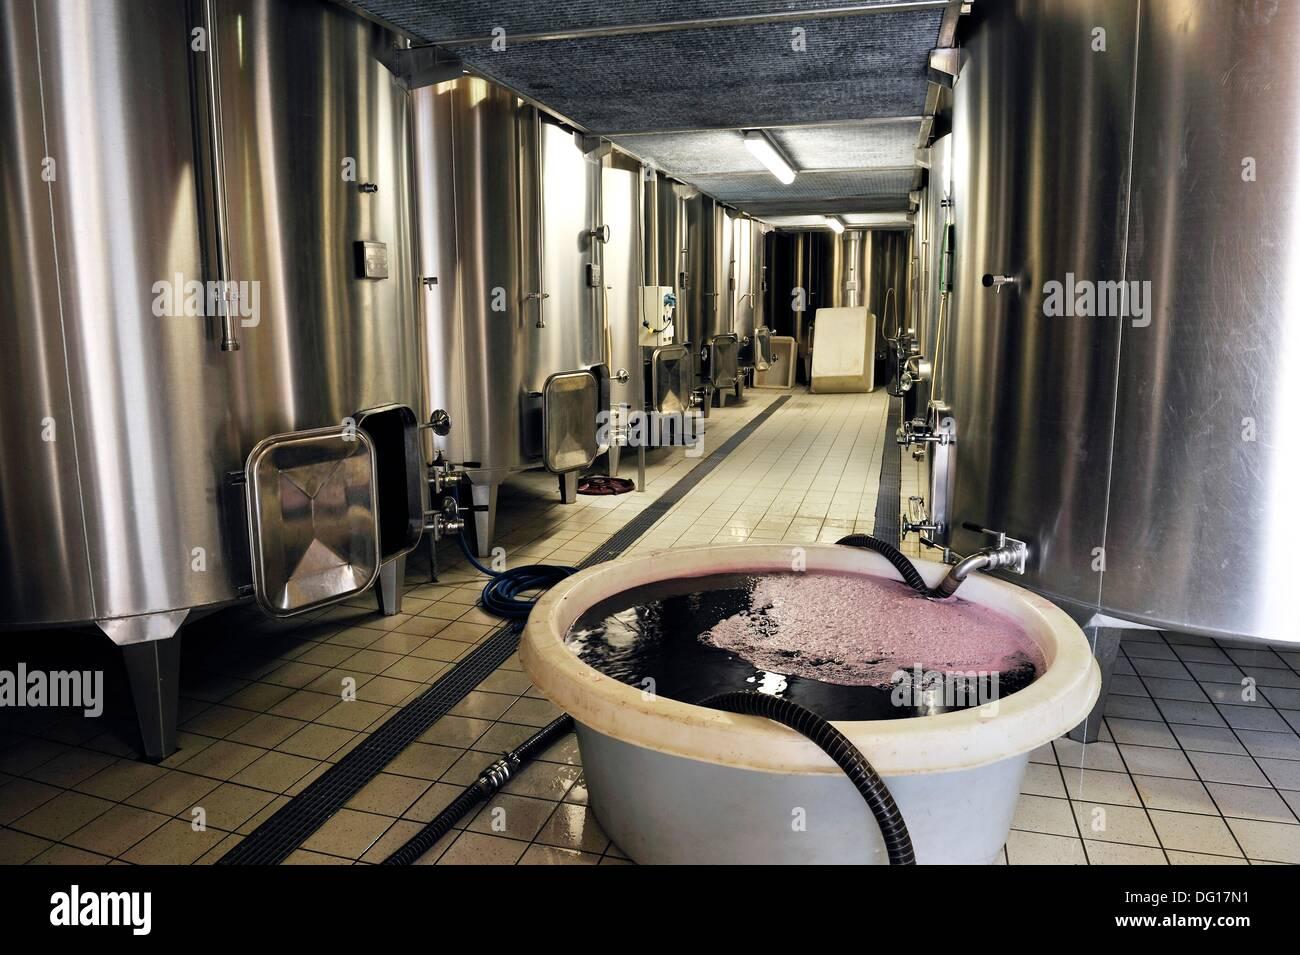 wine making vat of Chateau Beauregard, Pomerol, Gironde department, Aquitaine region, south-western France, Europe - Stock Image